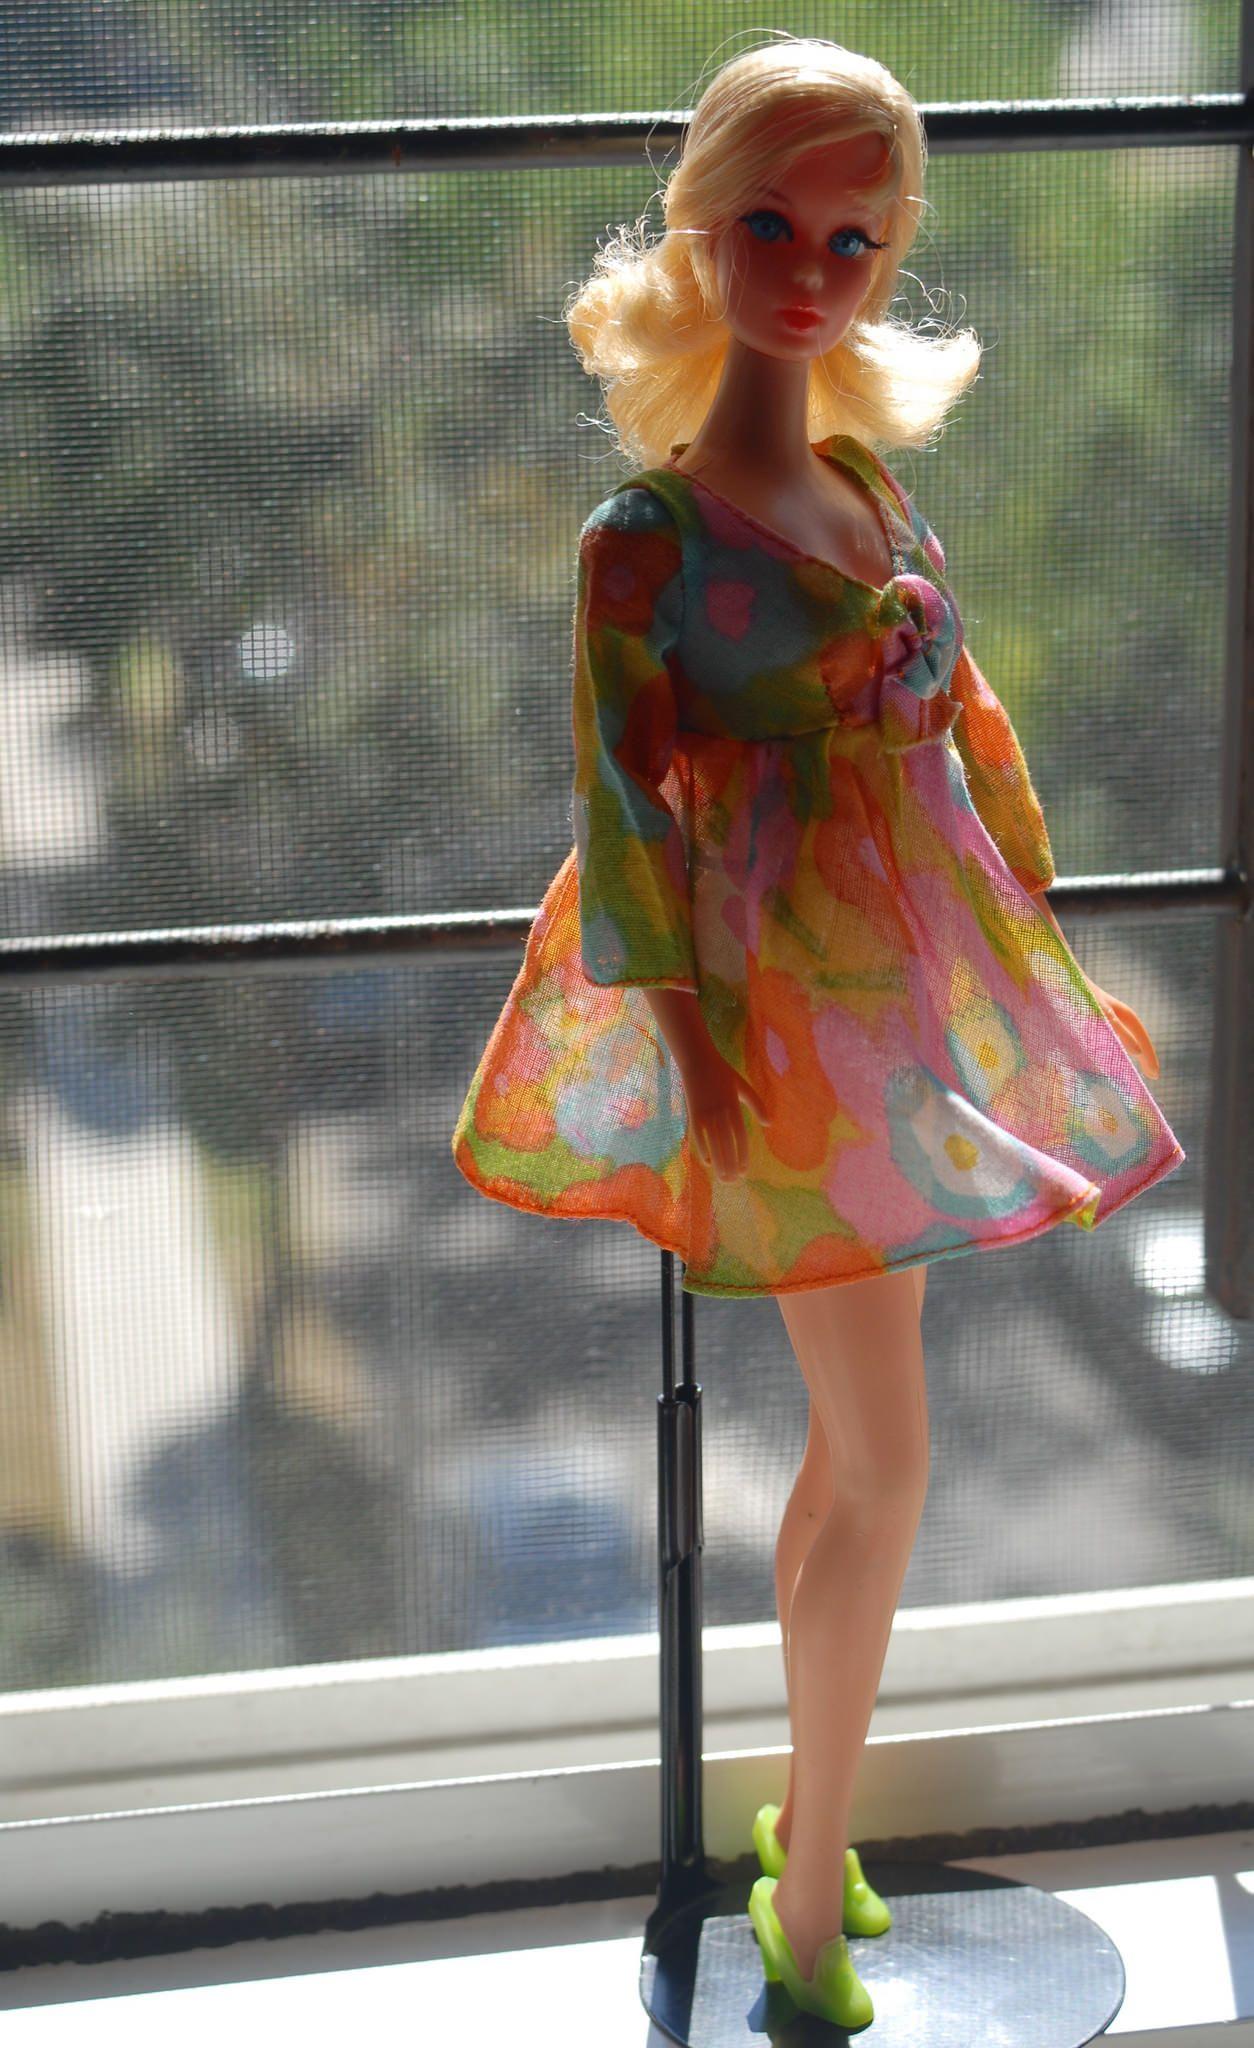 Blonde barbie pink dress  Vintage Talking Barbie  blonde  Barbie Barbie doll and Vintage barbie